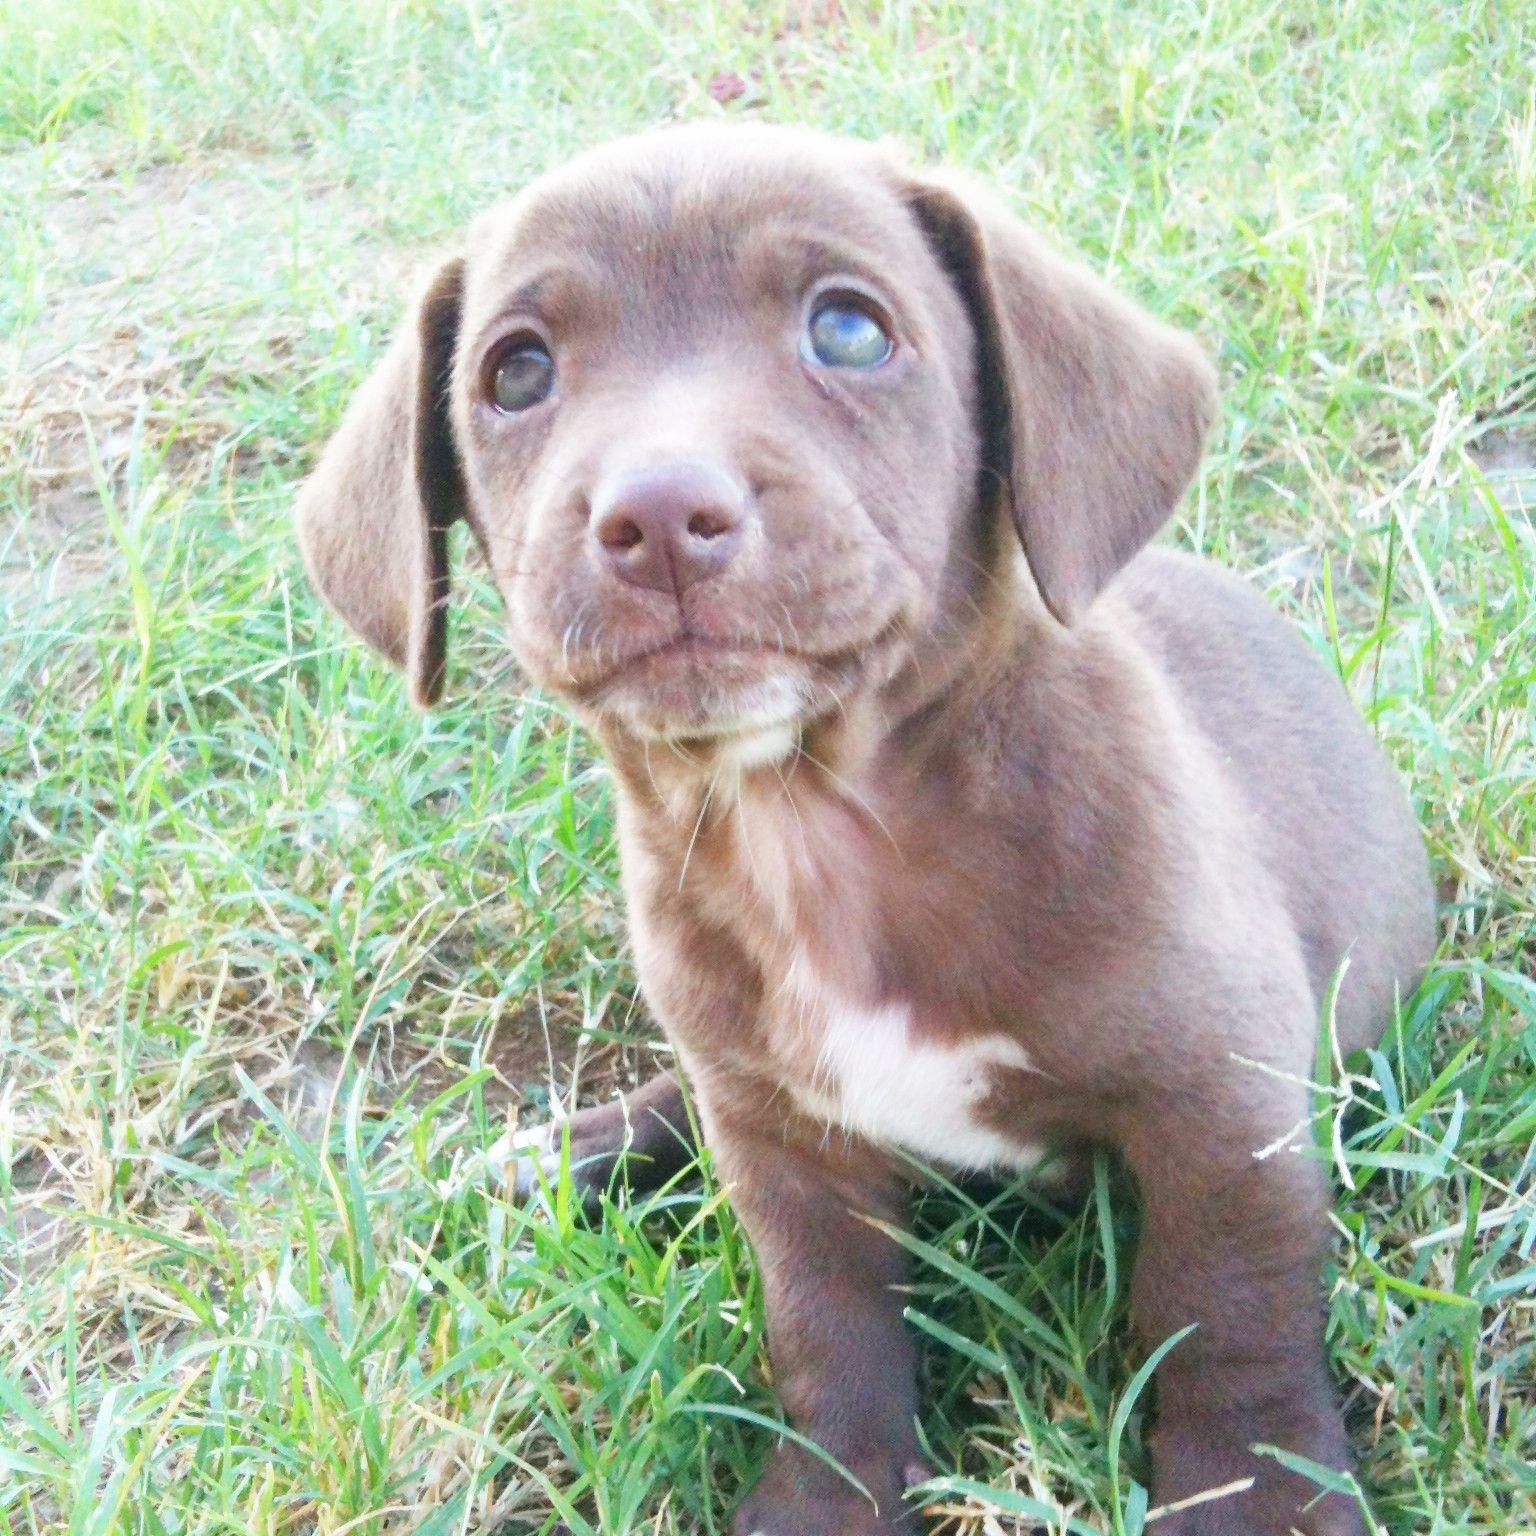 Pics photos dachshund chihuahua dog mix dogs pictures photos pics - Chihuahua Weiner Dog Mix Puppy